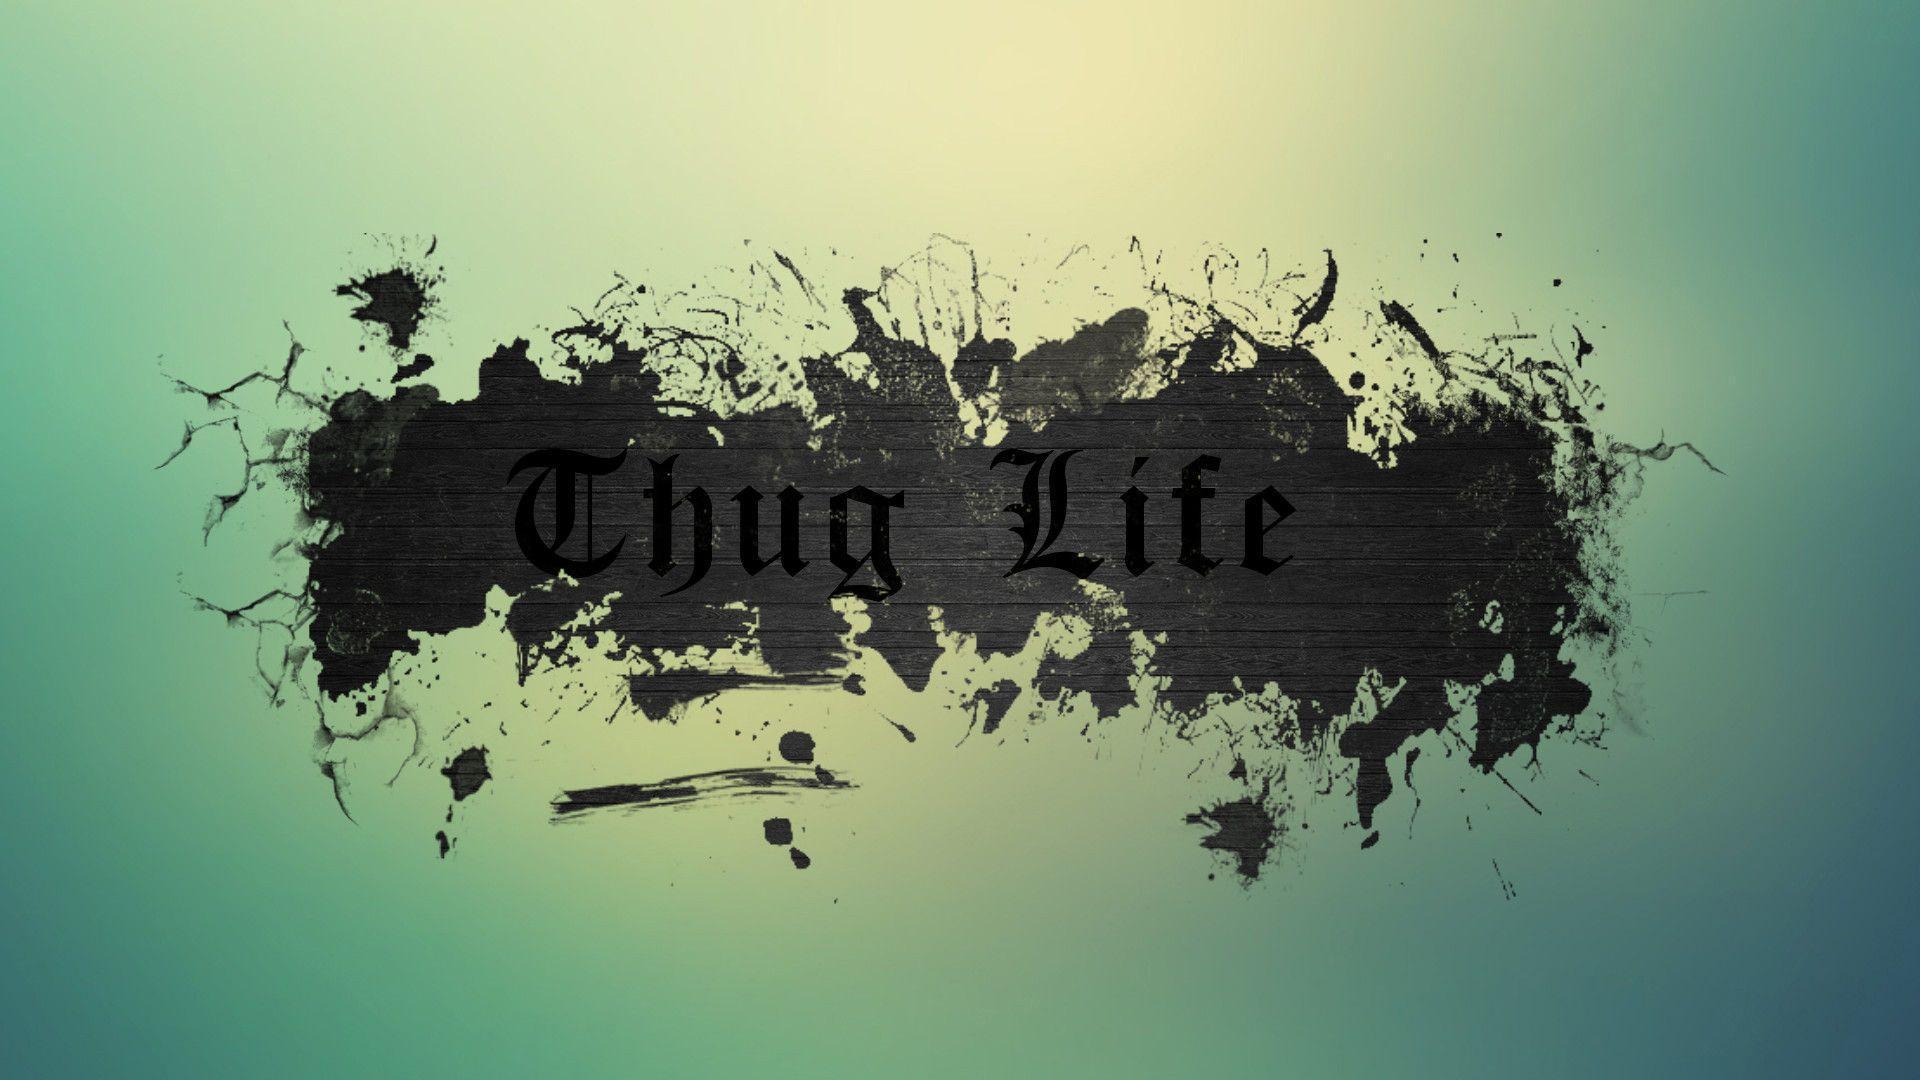 thug life wallpapers wallpaper cave